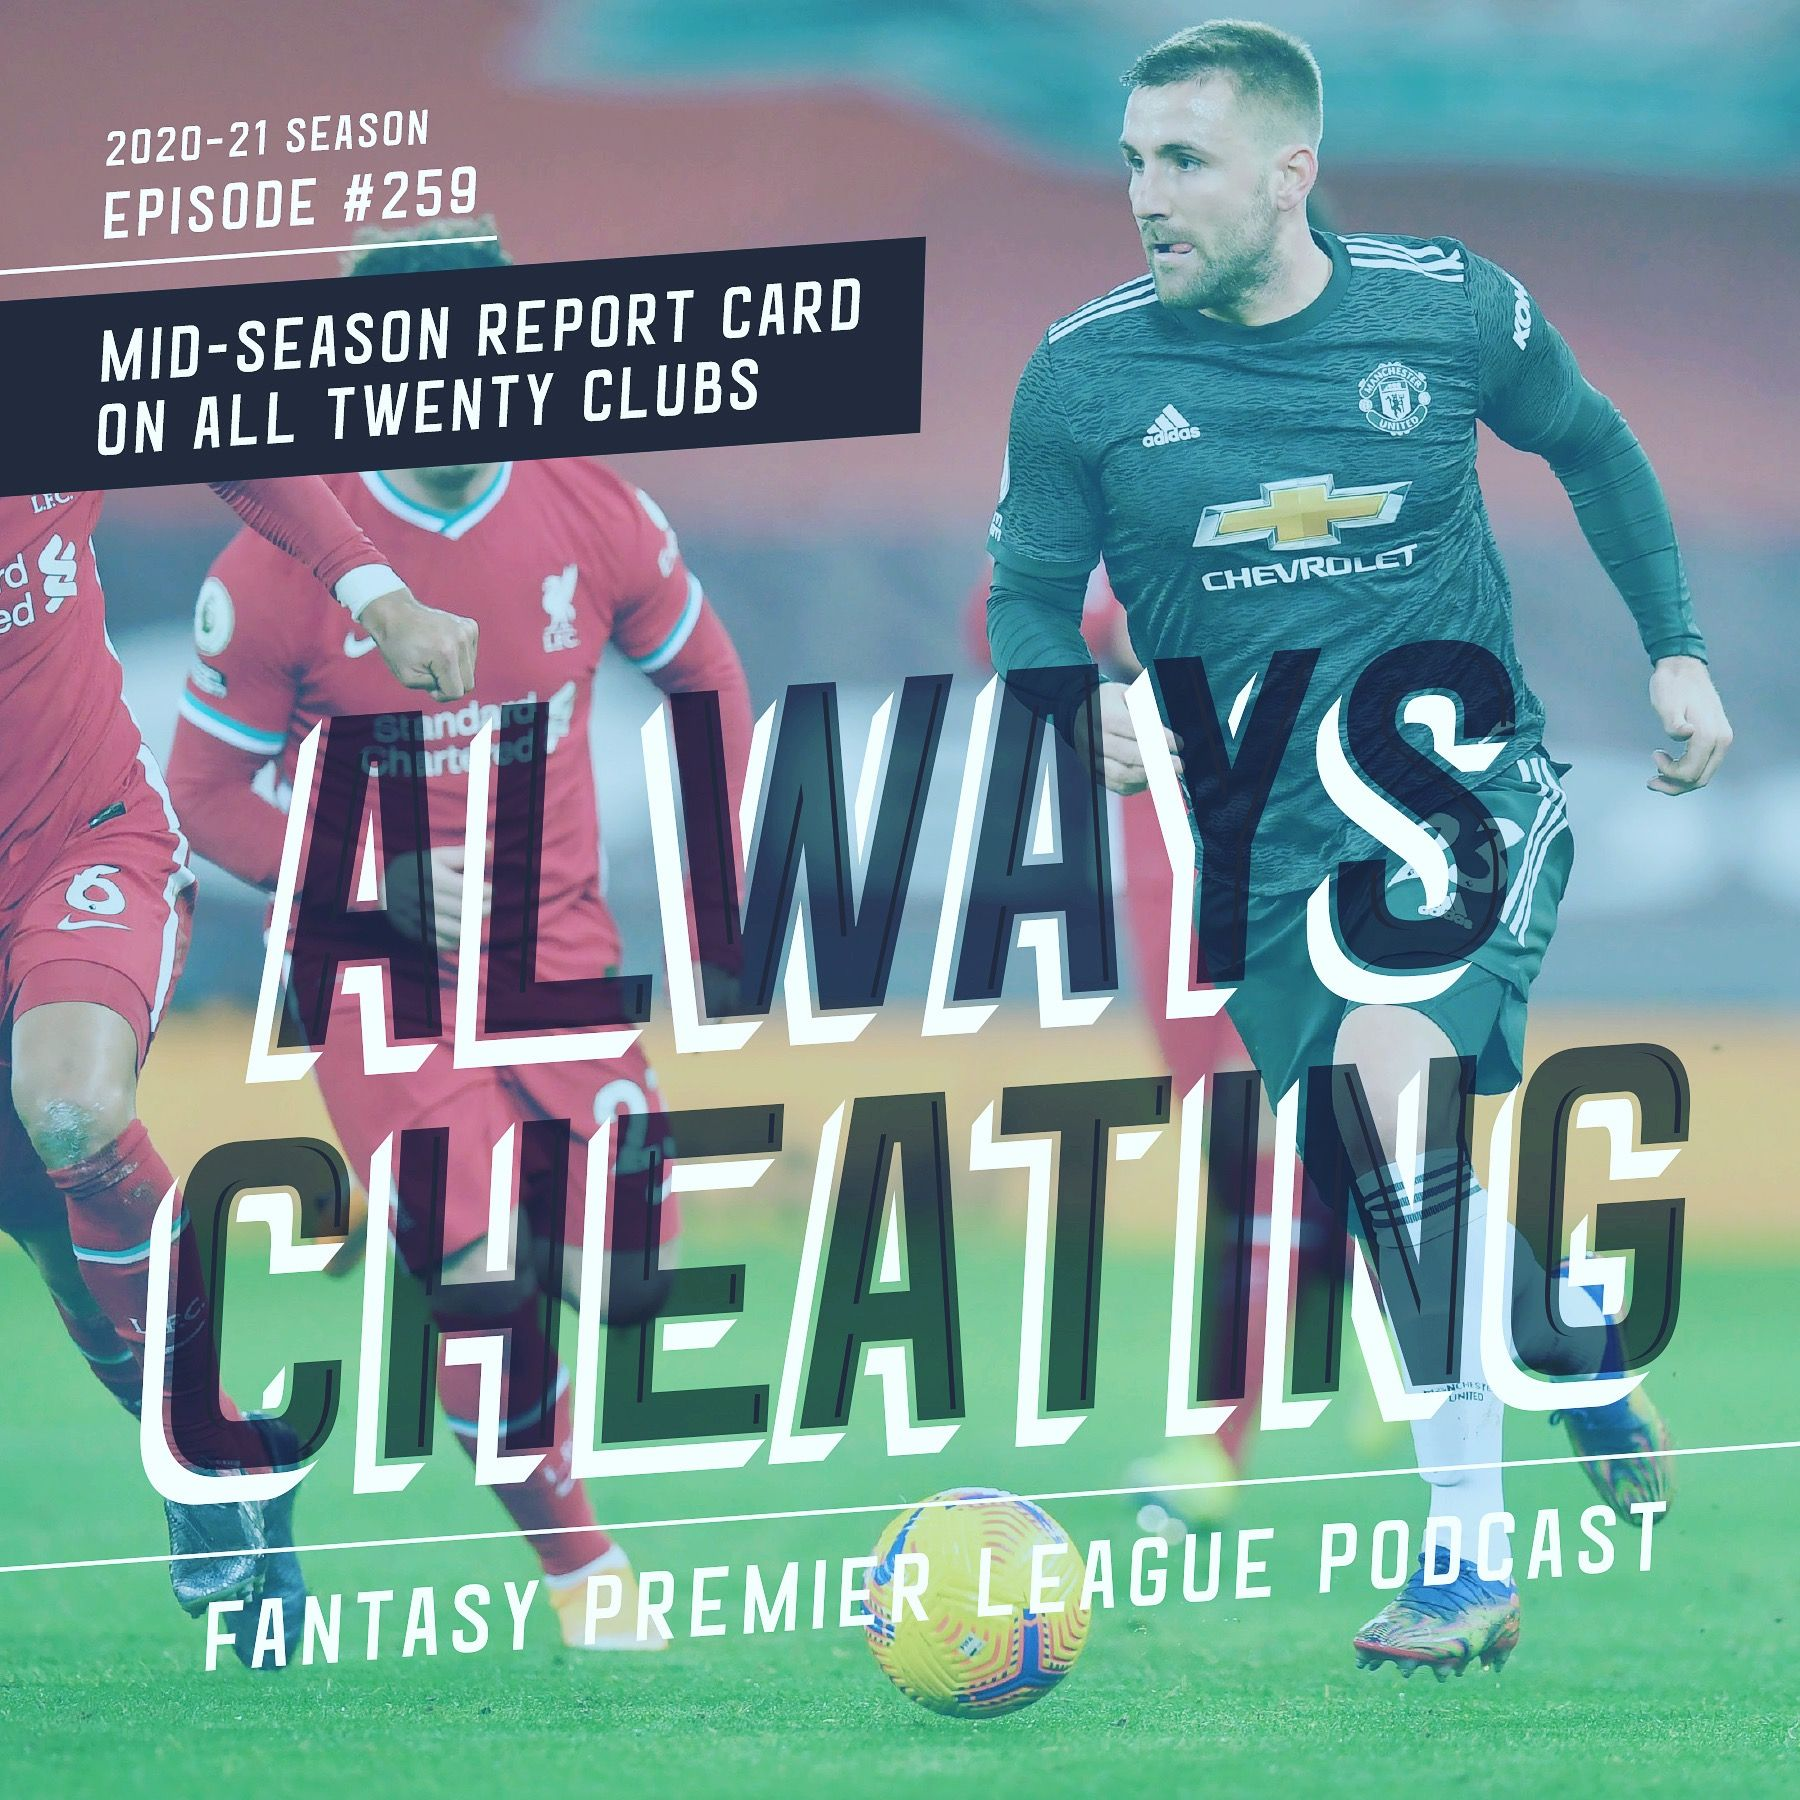 Mid-Season Report Card on All Twenty Premier League Clubs